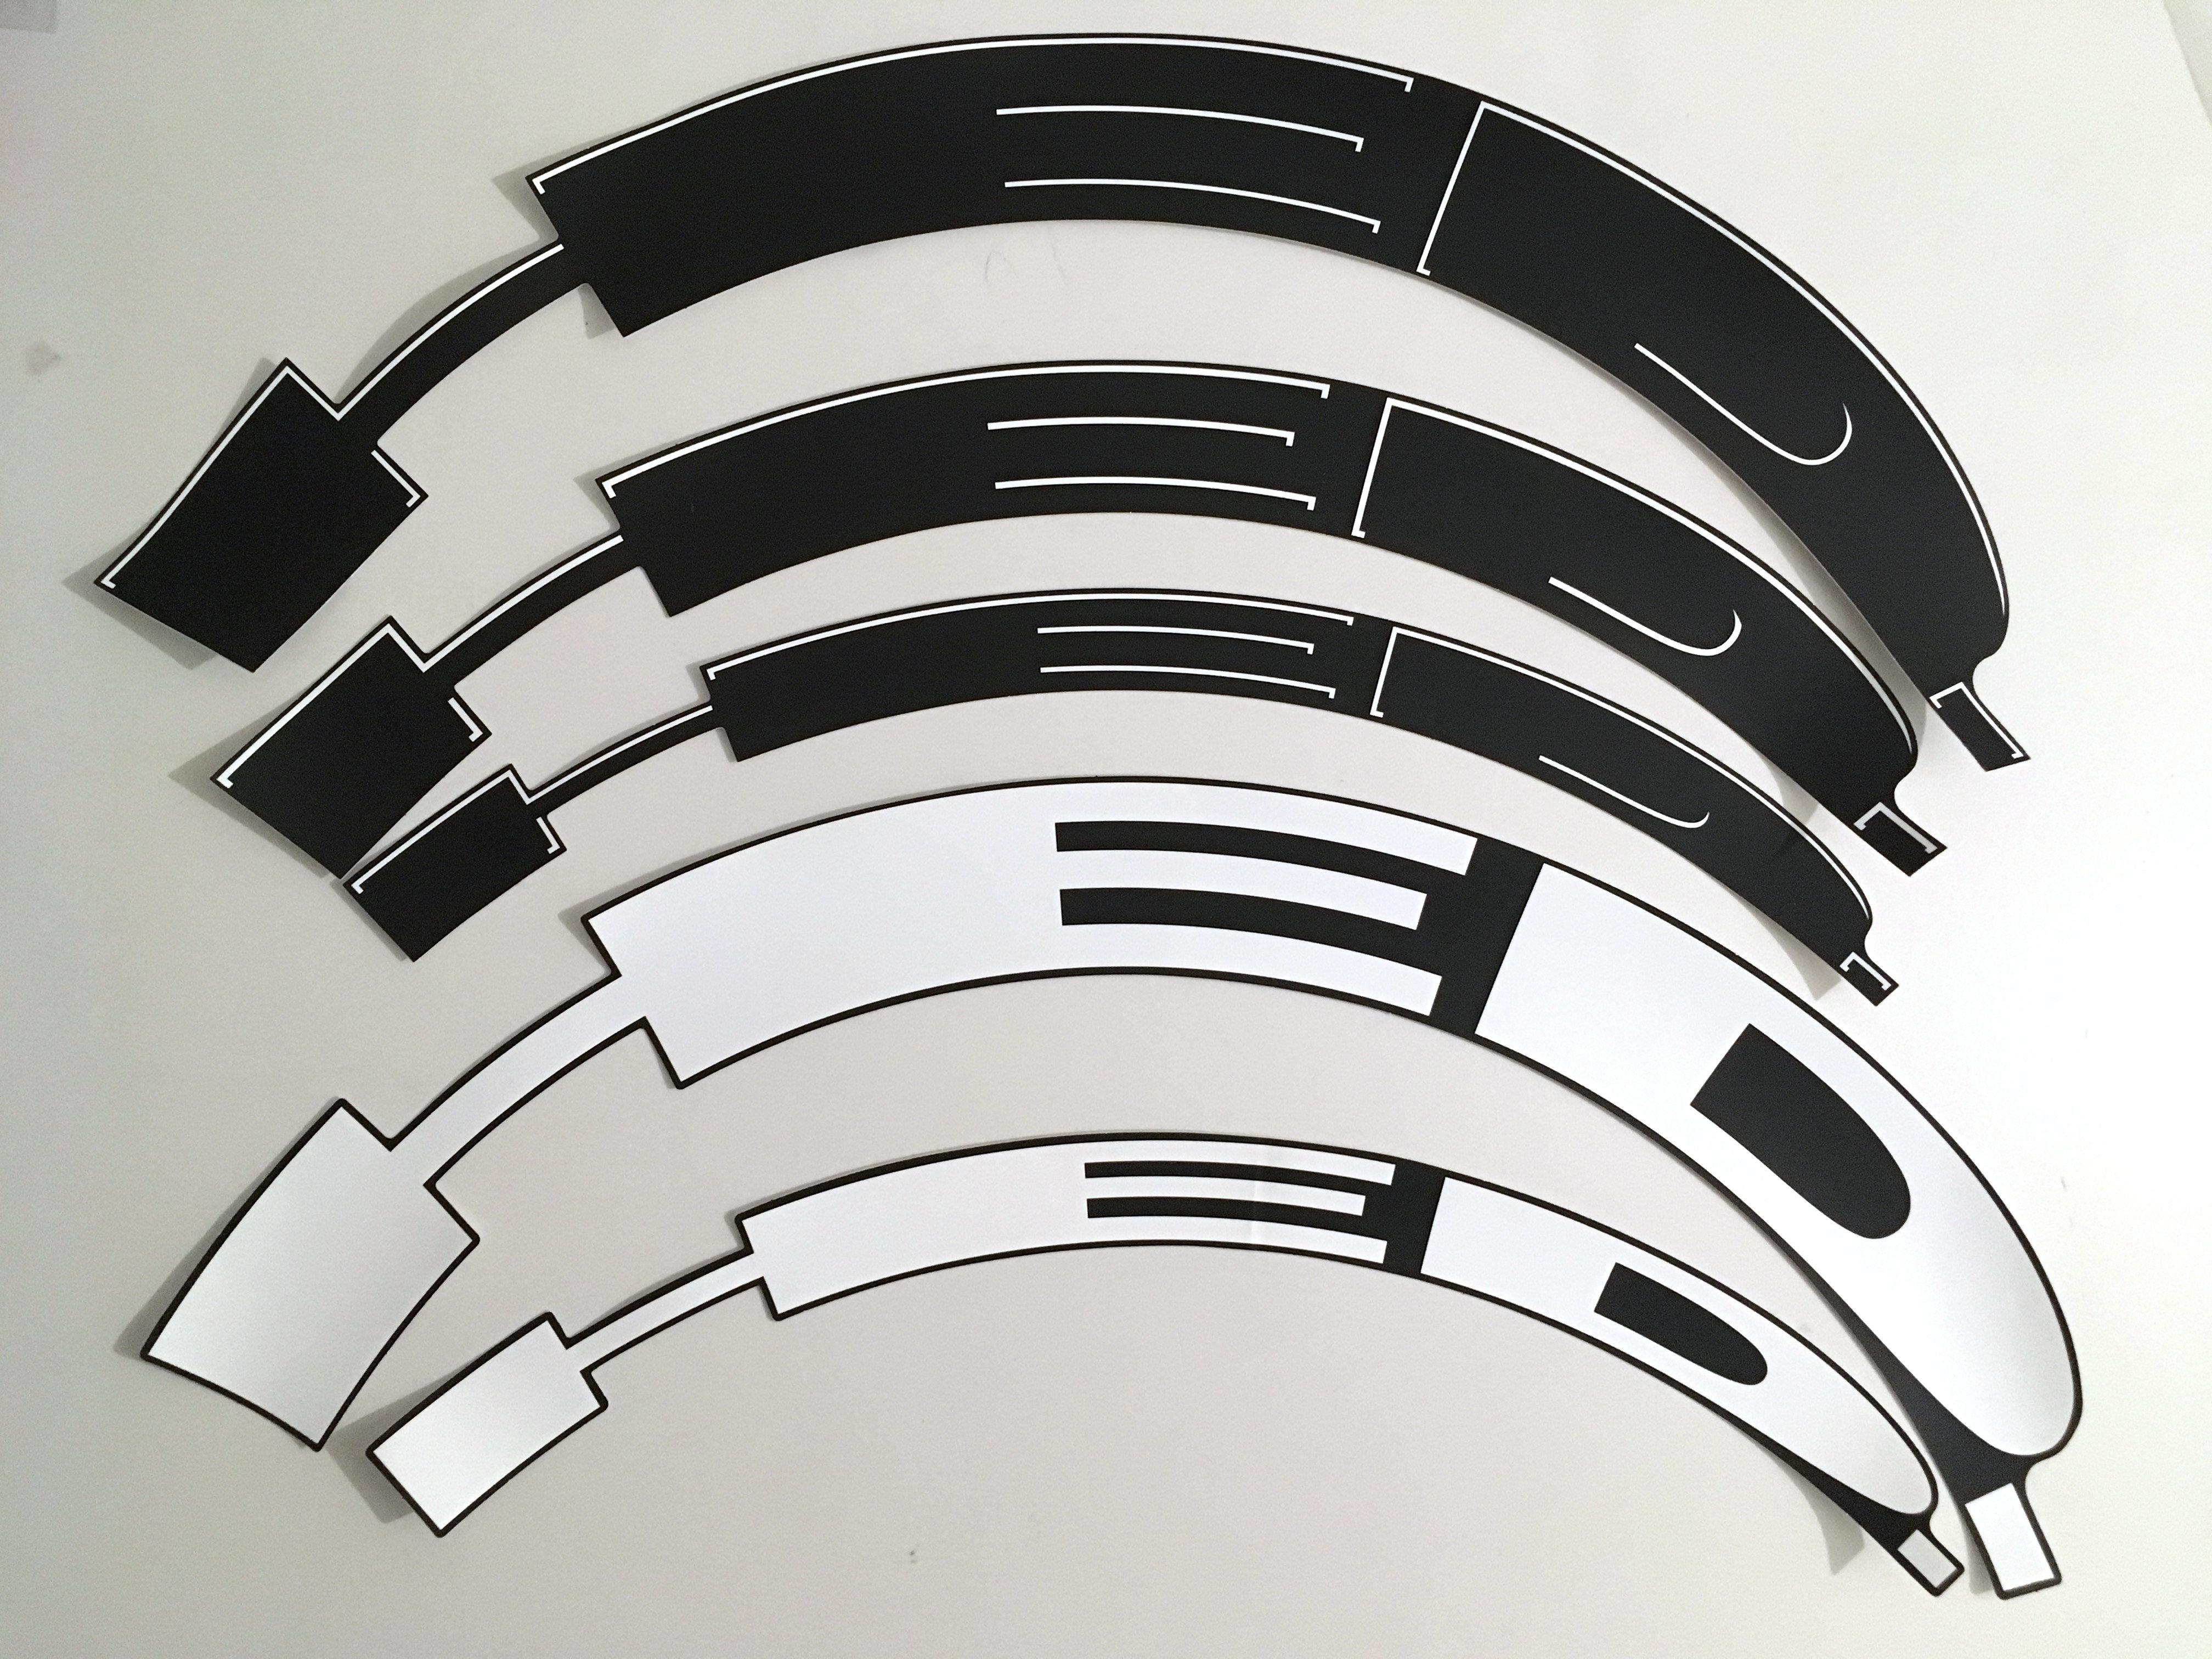 HED BLACK// WHITE OUTLINE WHEELS RIM DECALS STICKERS SET FOR 70//88 RIM DEPTH